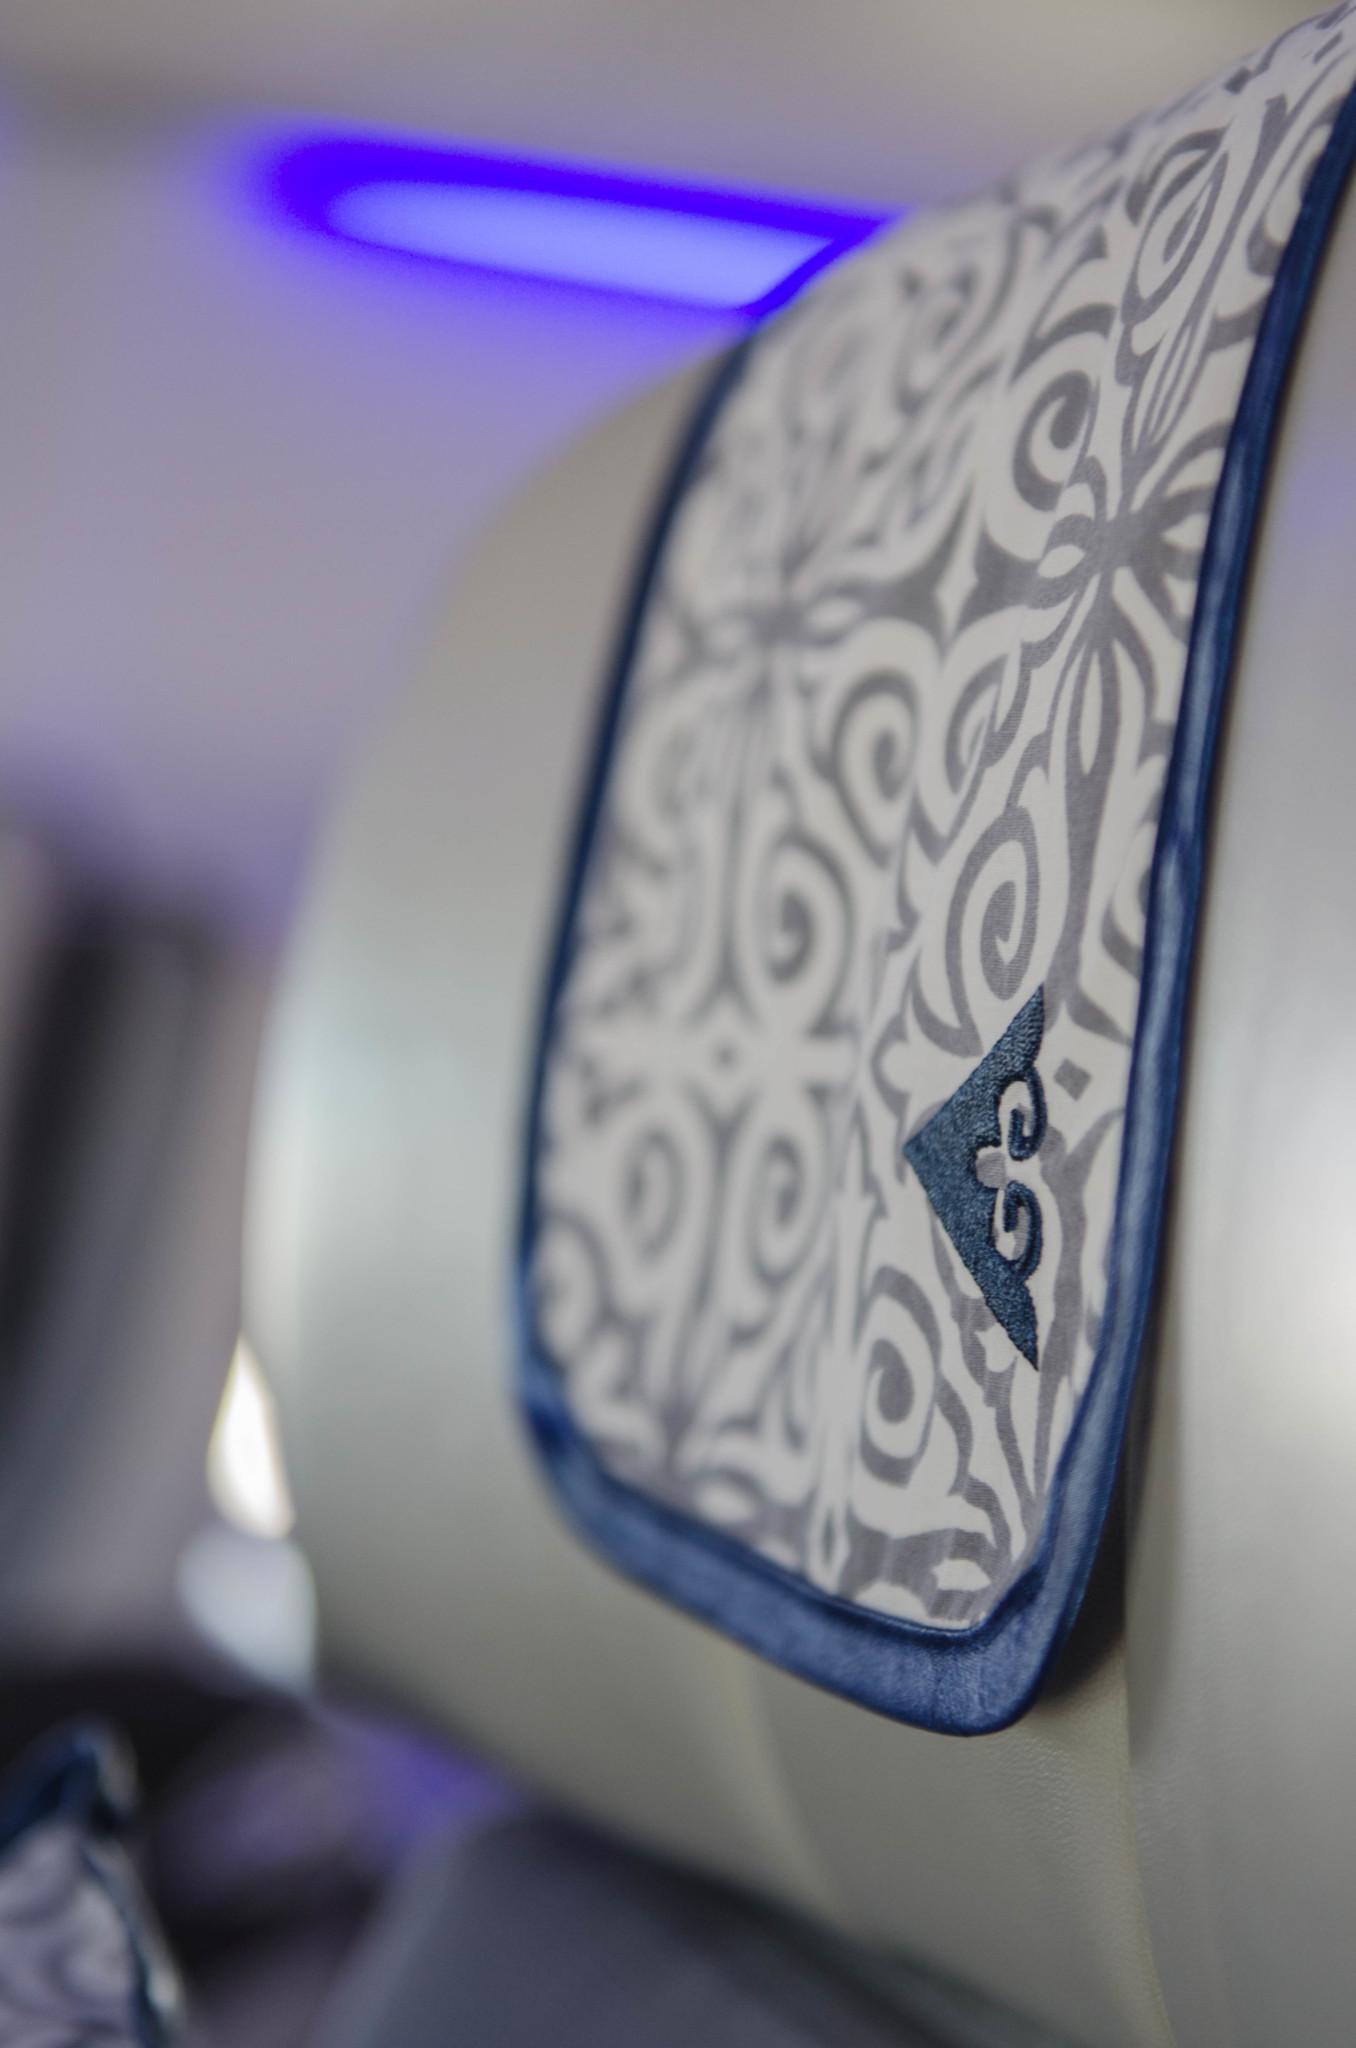 Schickes Design bei Air Astana